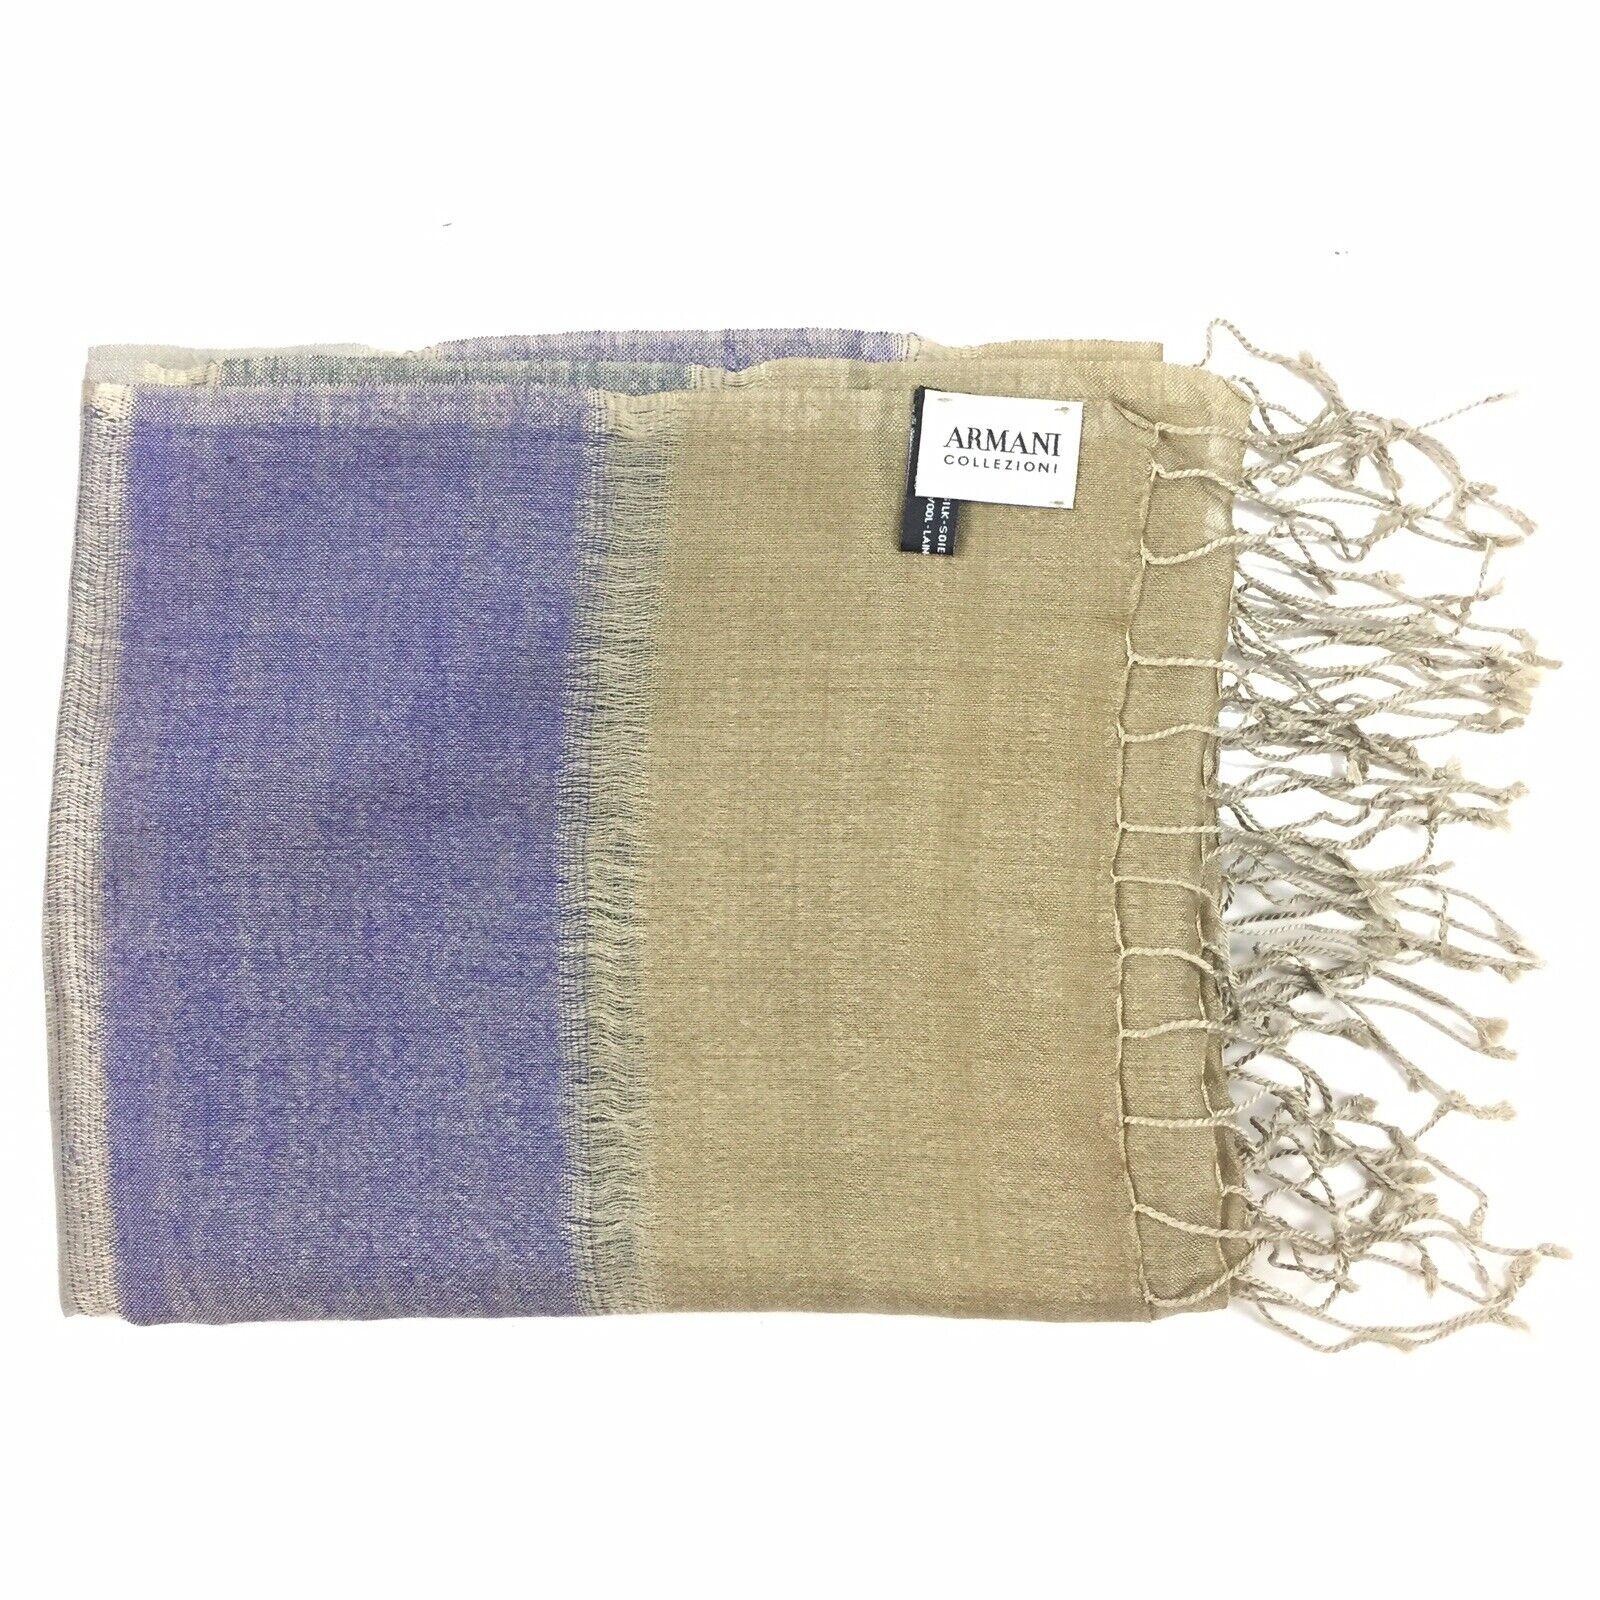 "Armani Collection Silk / Wool Fringe Scarf - 80"" X 33"" - Blue, Tan Striped"